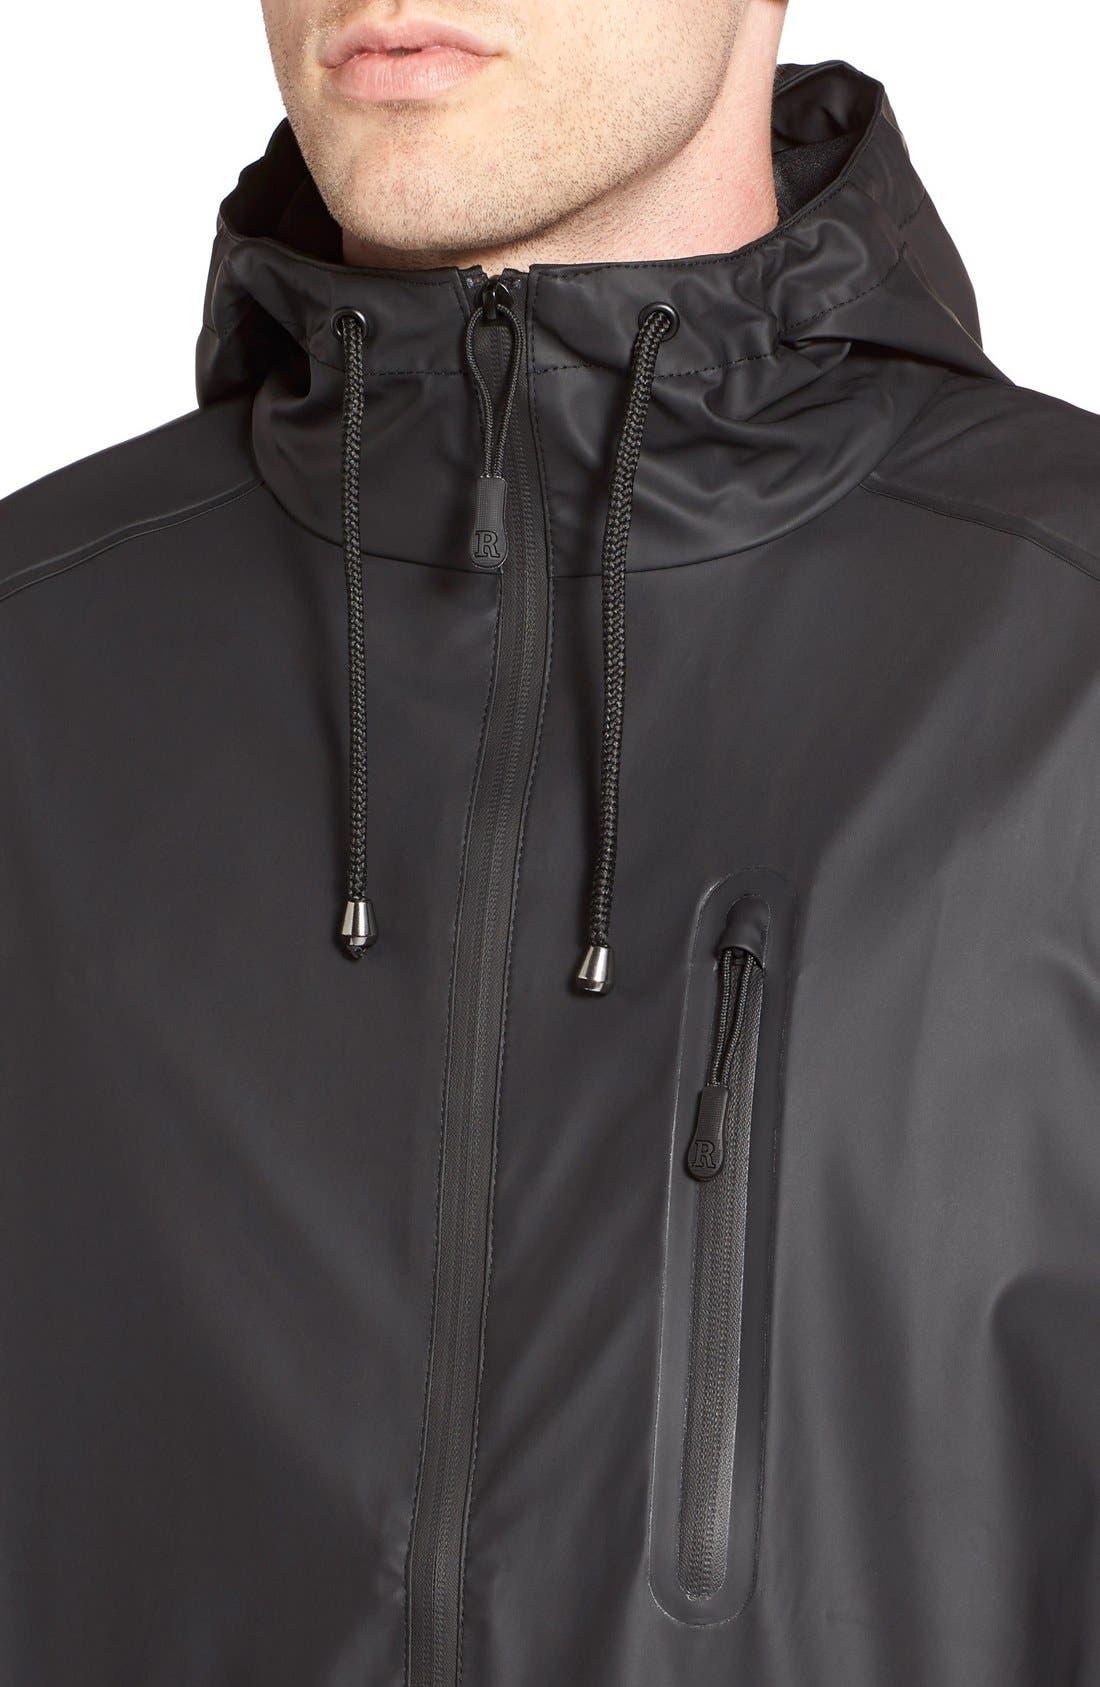 Waterproof Parka Coat,                             Alternate thumbnail 8, color,                             BLACK